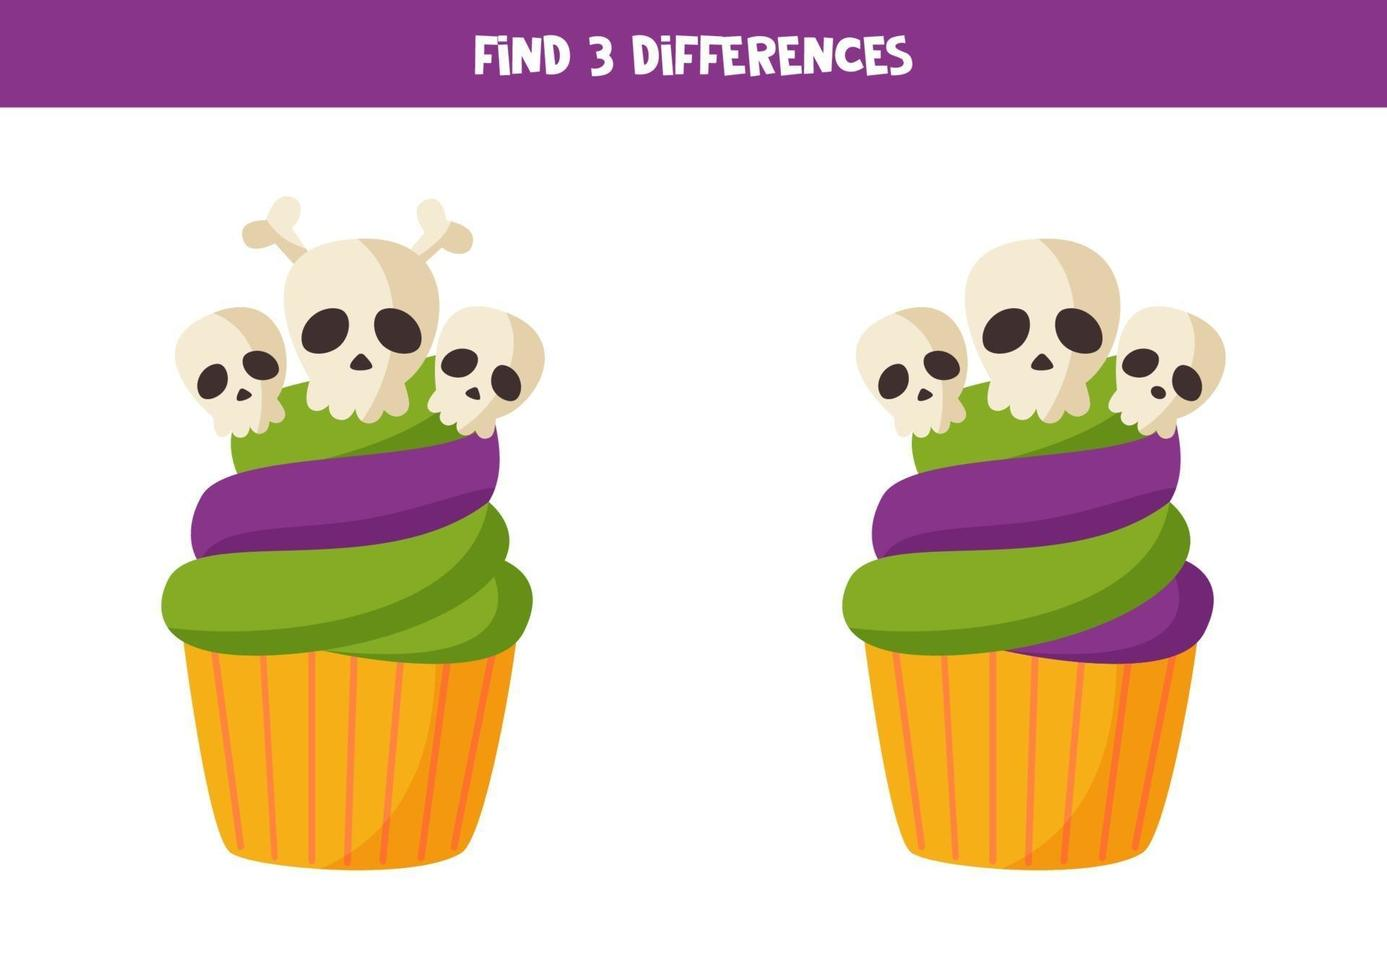 encontre 3 diferenças entre dois cupcakes de halloween. vetor